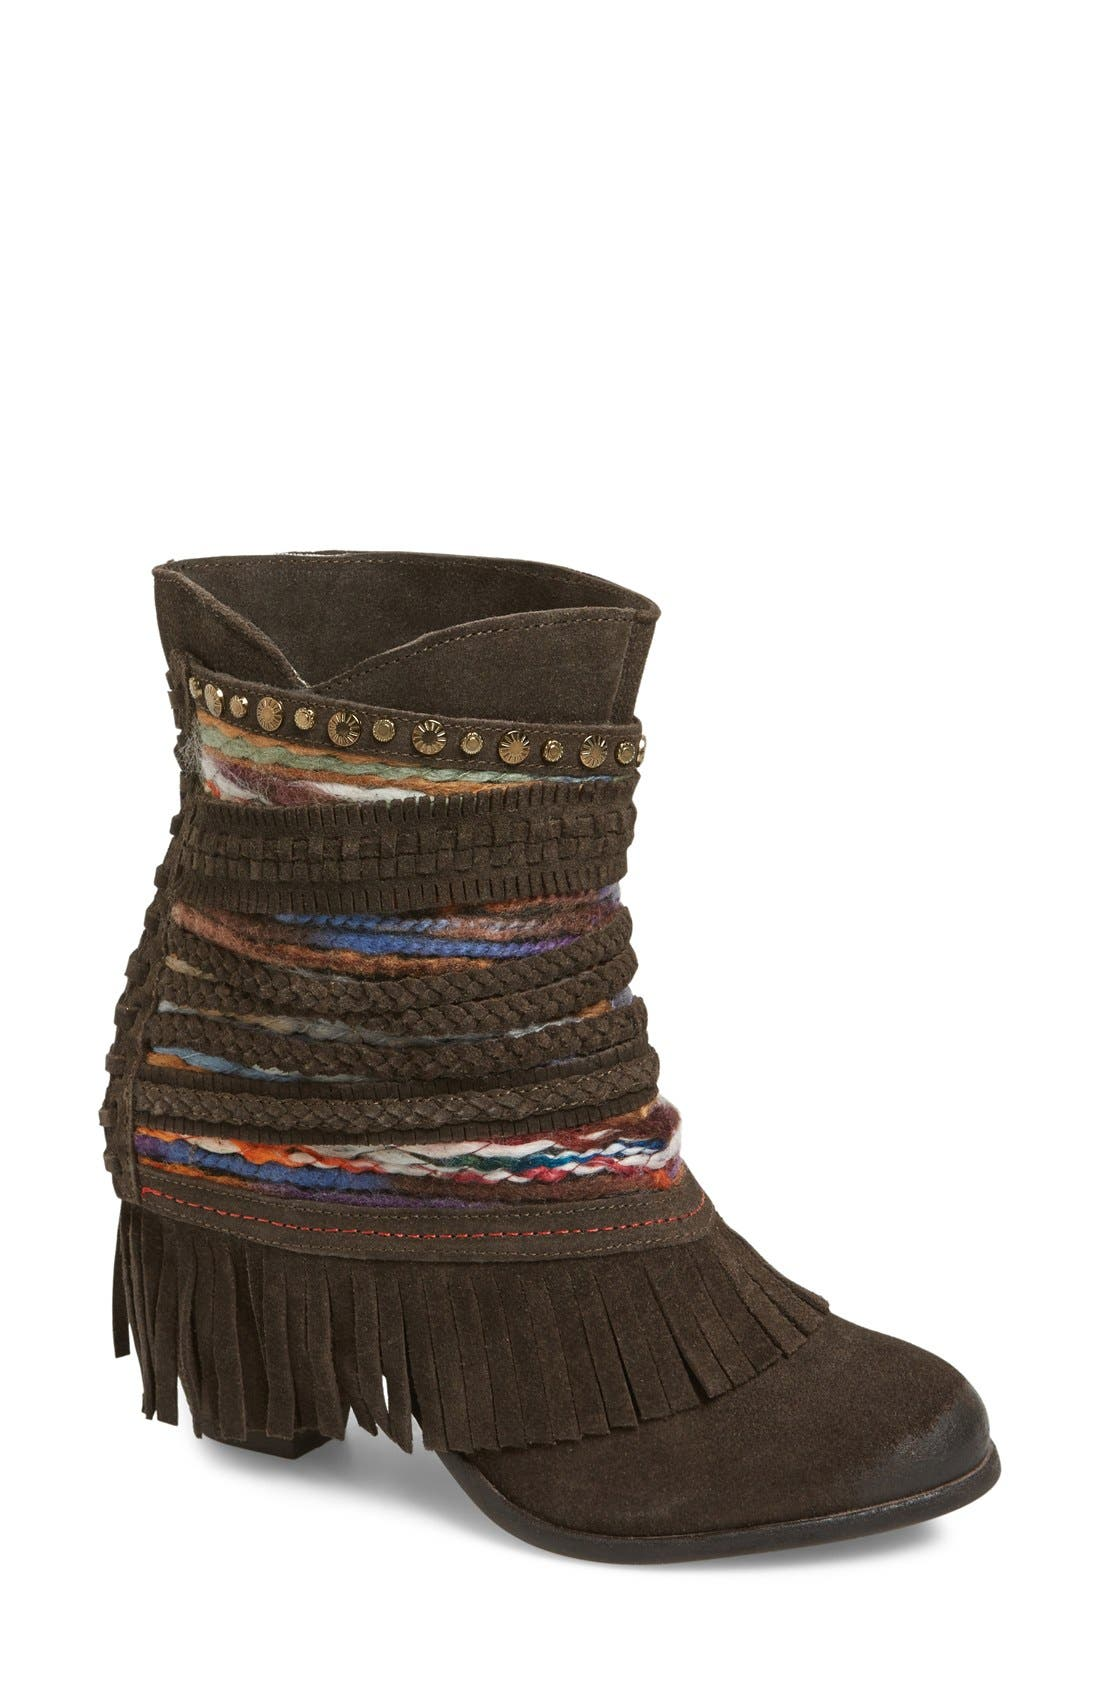 Alternate Image 1 Selected - Naughty Monkey 'Poncho' Boot (Women)